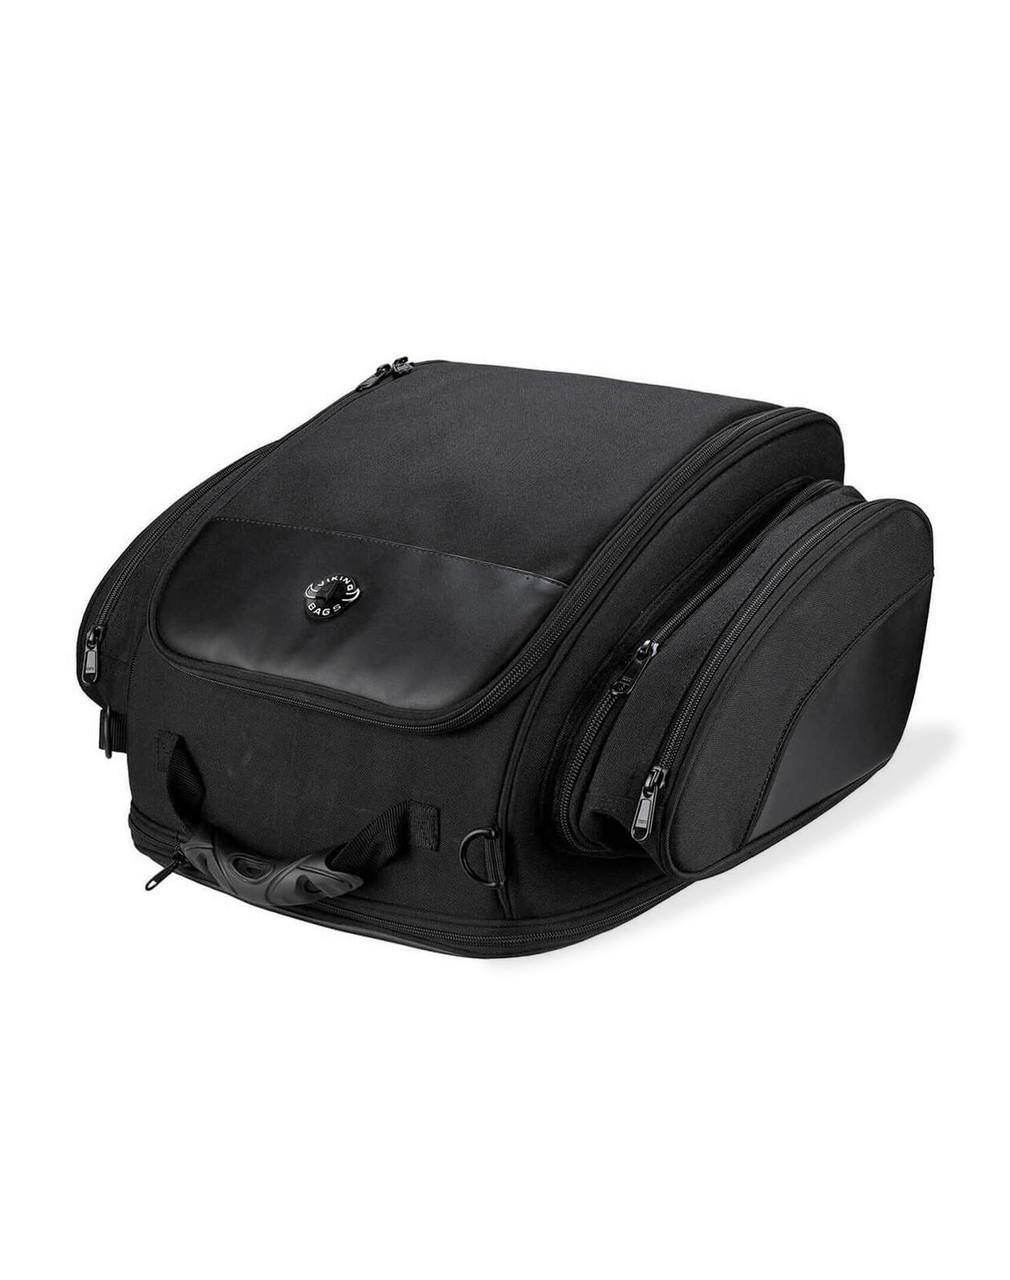 VikingBags Large Motorcycle Tail Bag For Harley Davidson Main View